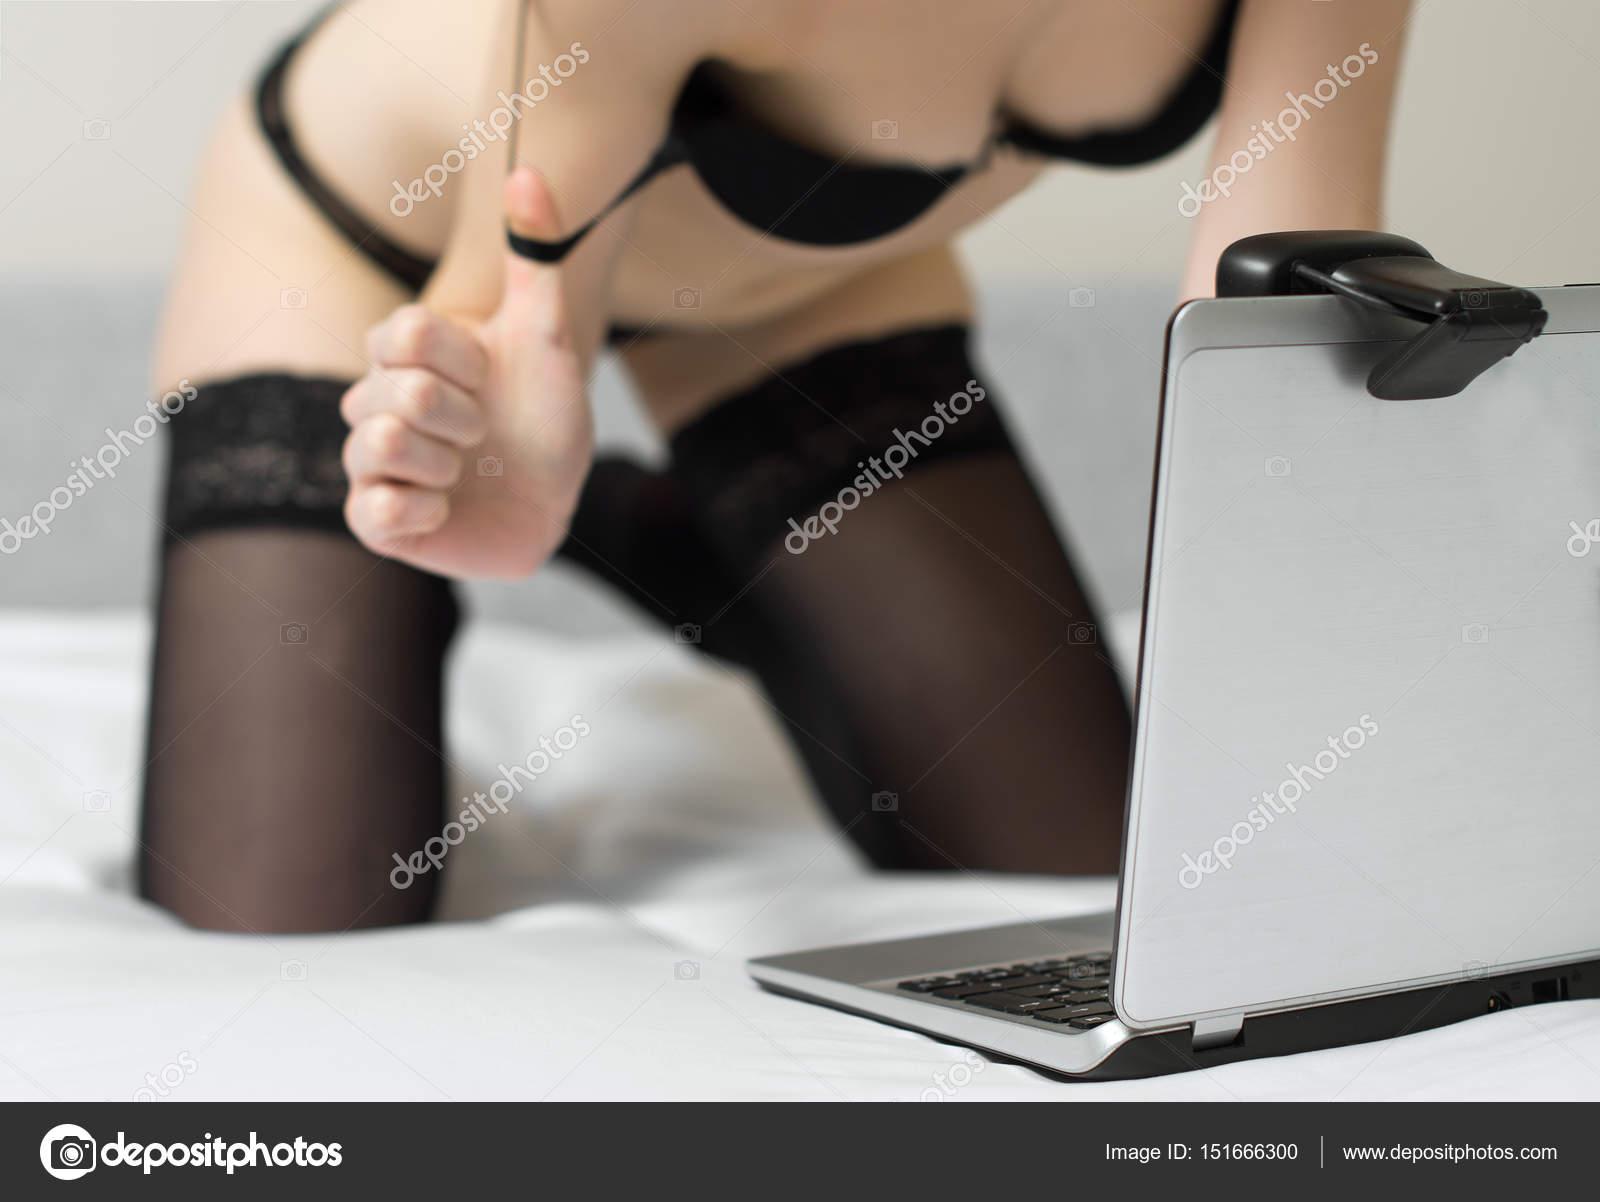 Веб камеры виртуальный секс